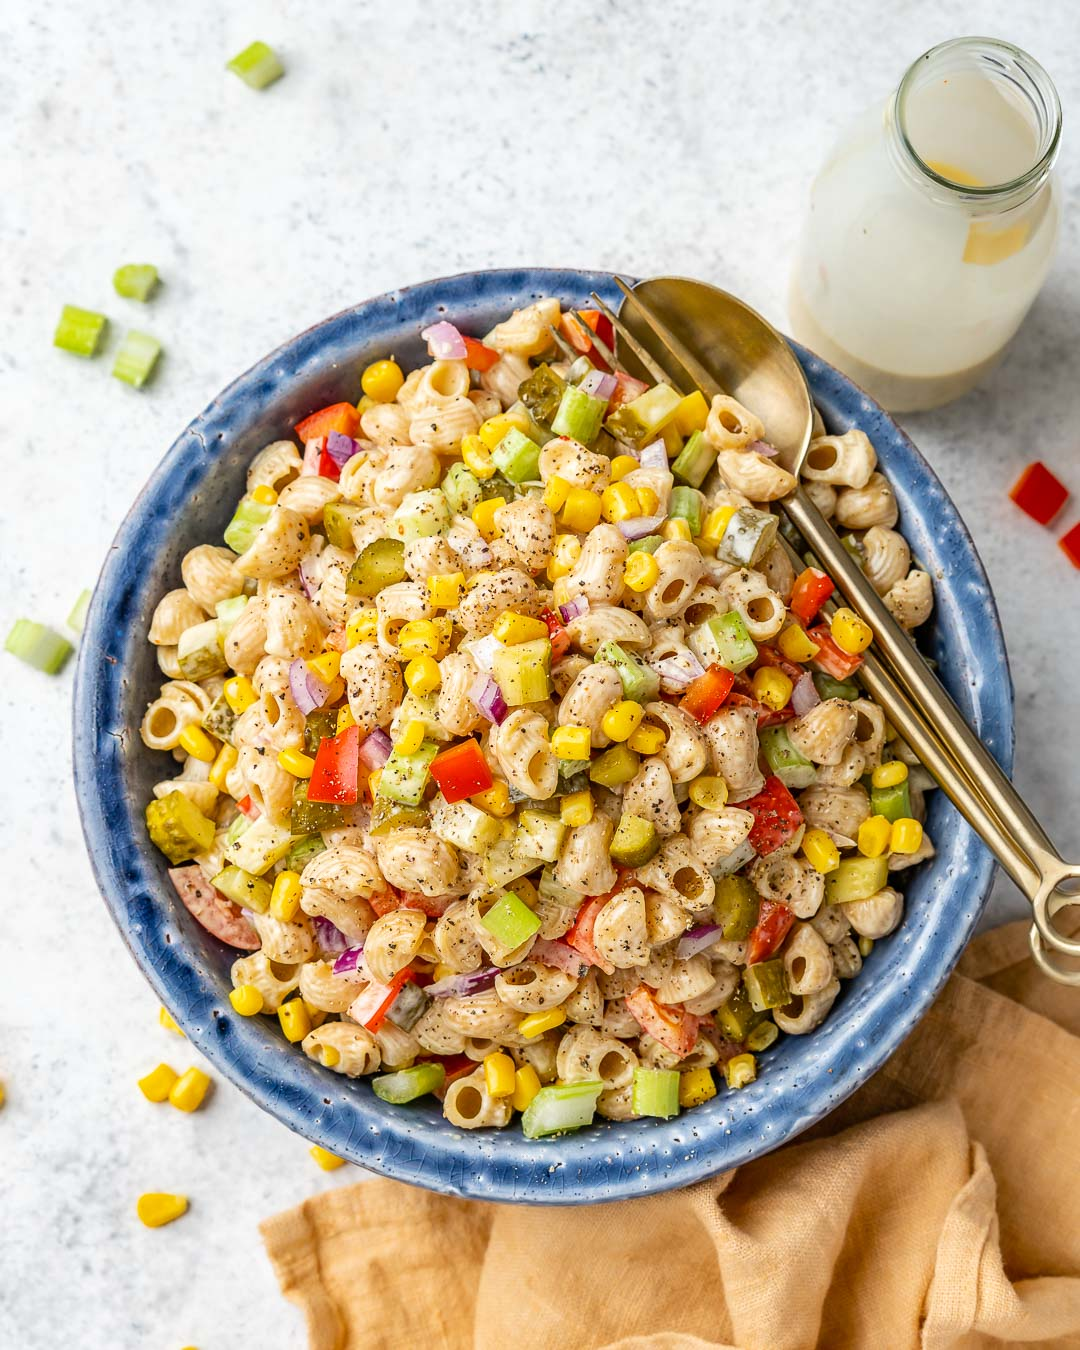 Easy Macaroni Salad Recipe – How To Make Vegan Macaroni Salad - 19